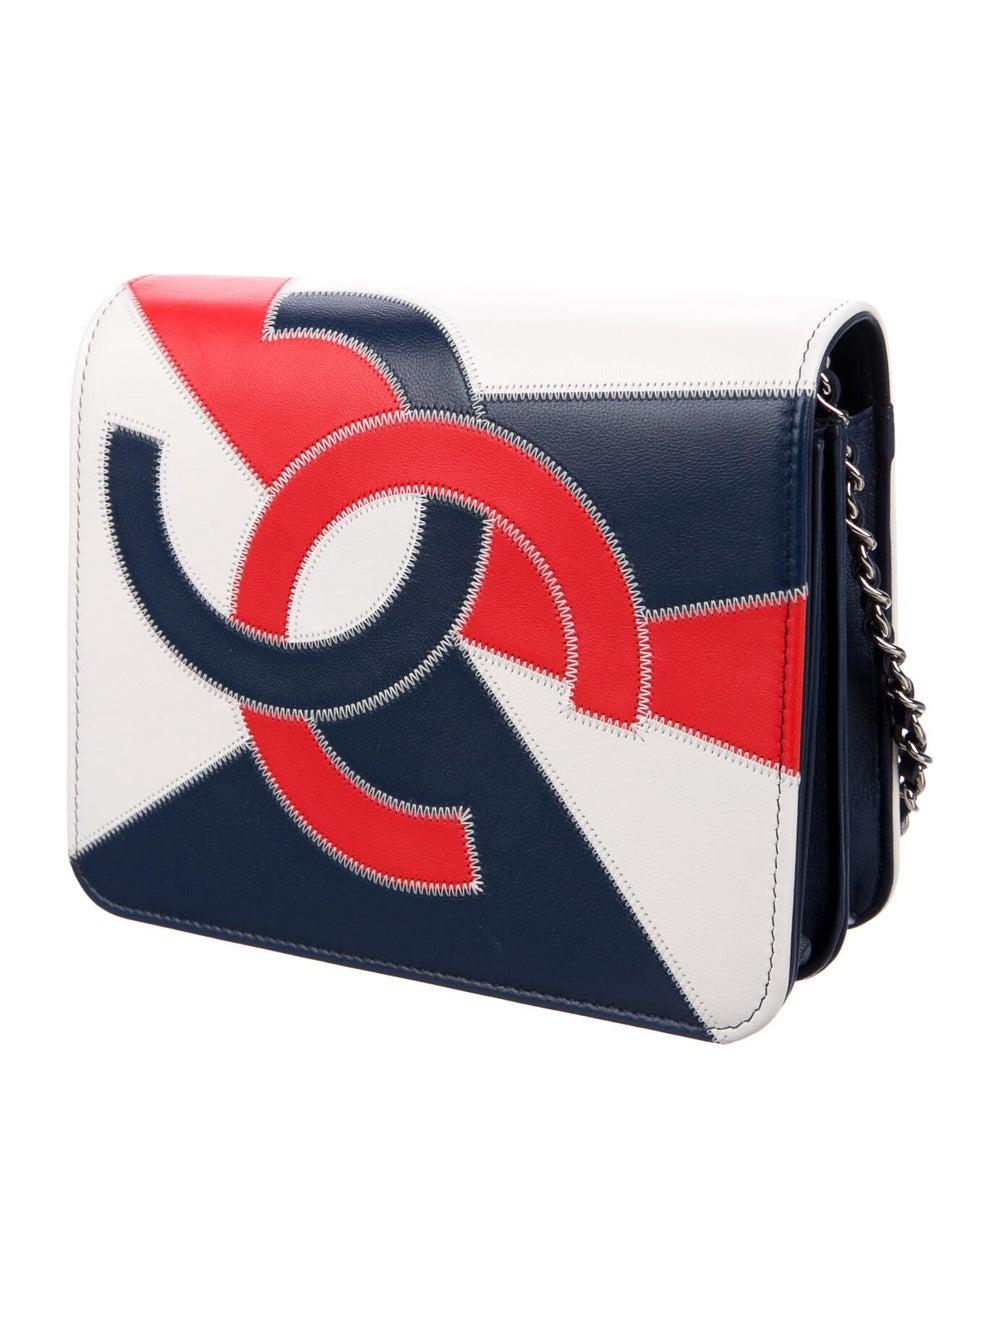 Chanel 2019 CC Accordion Flap Bag Blue - image 3